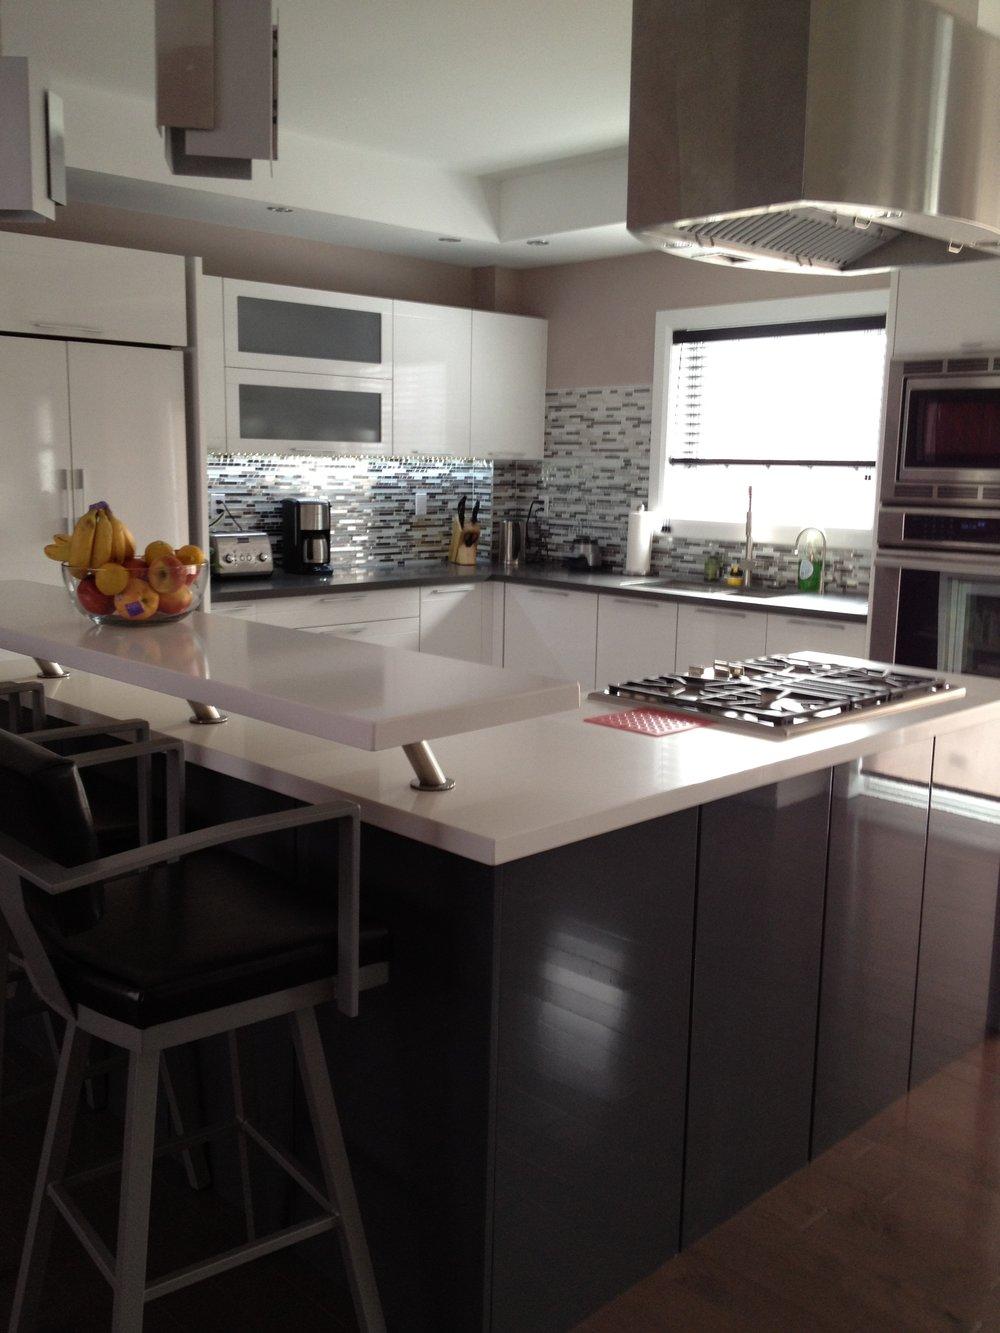 Kitchen 16 Pic 2.JPG